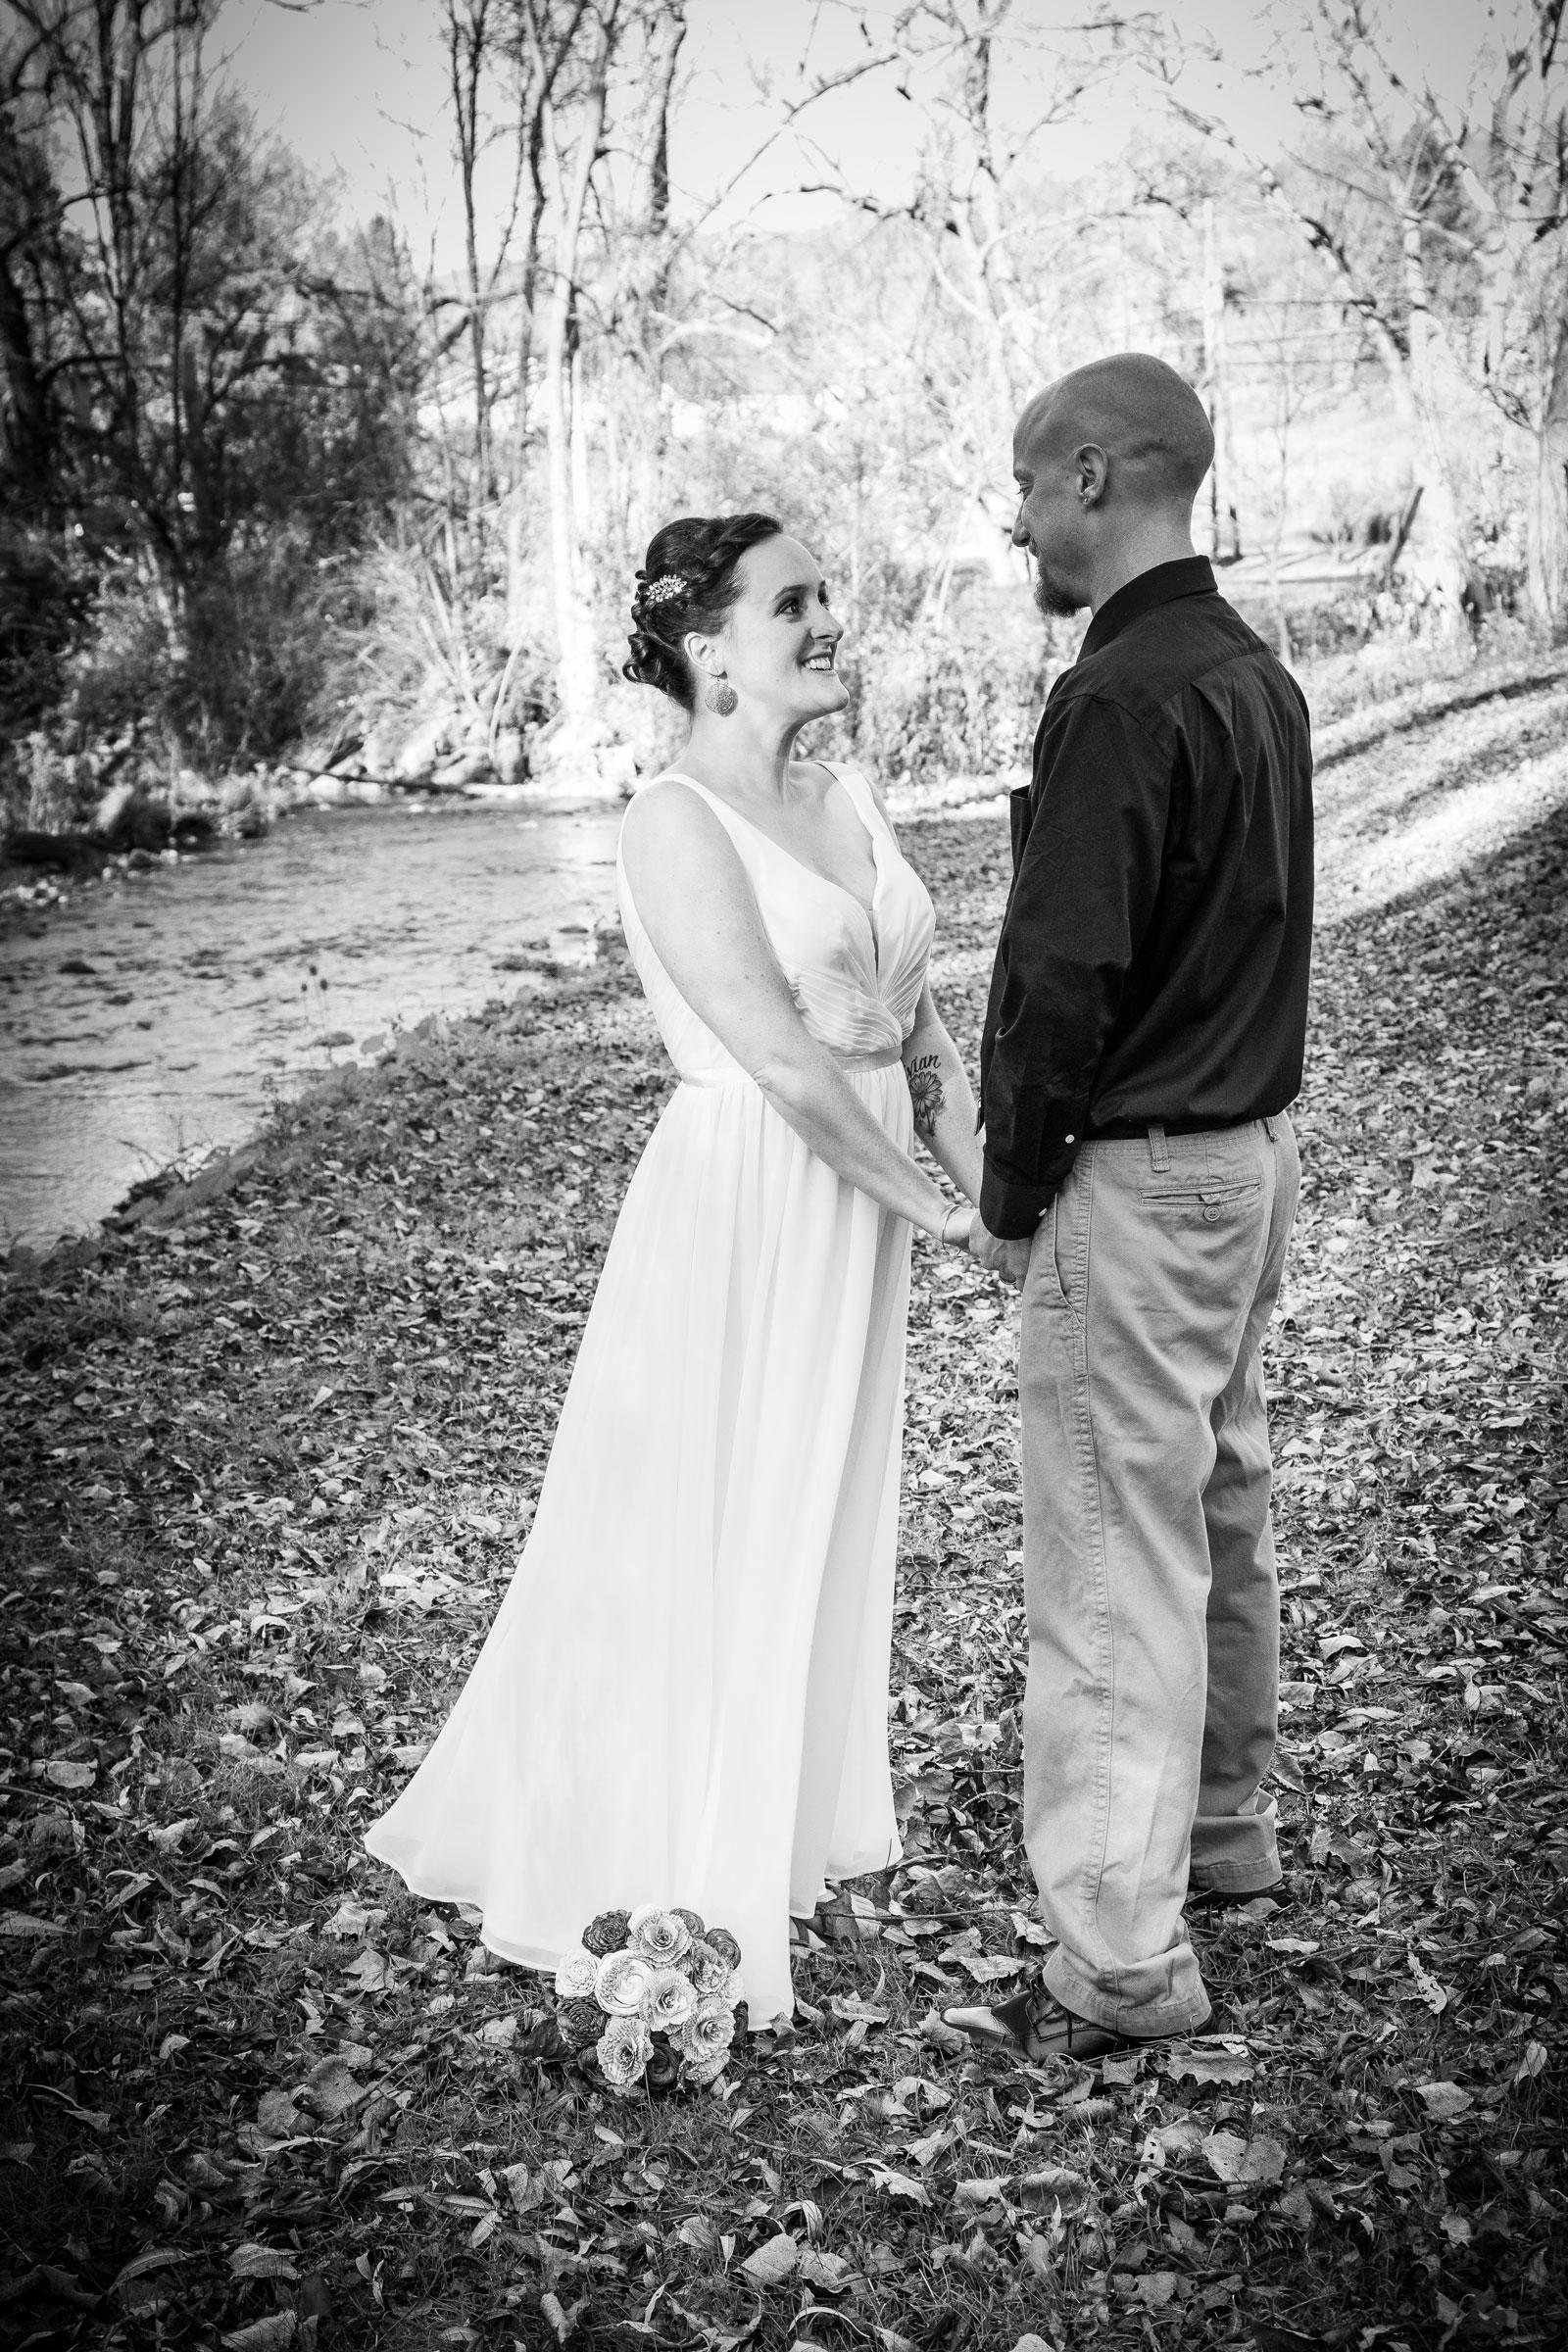 Erie, PA Wedding couple poses